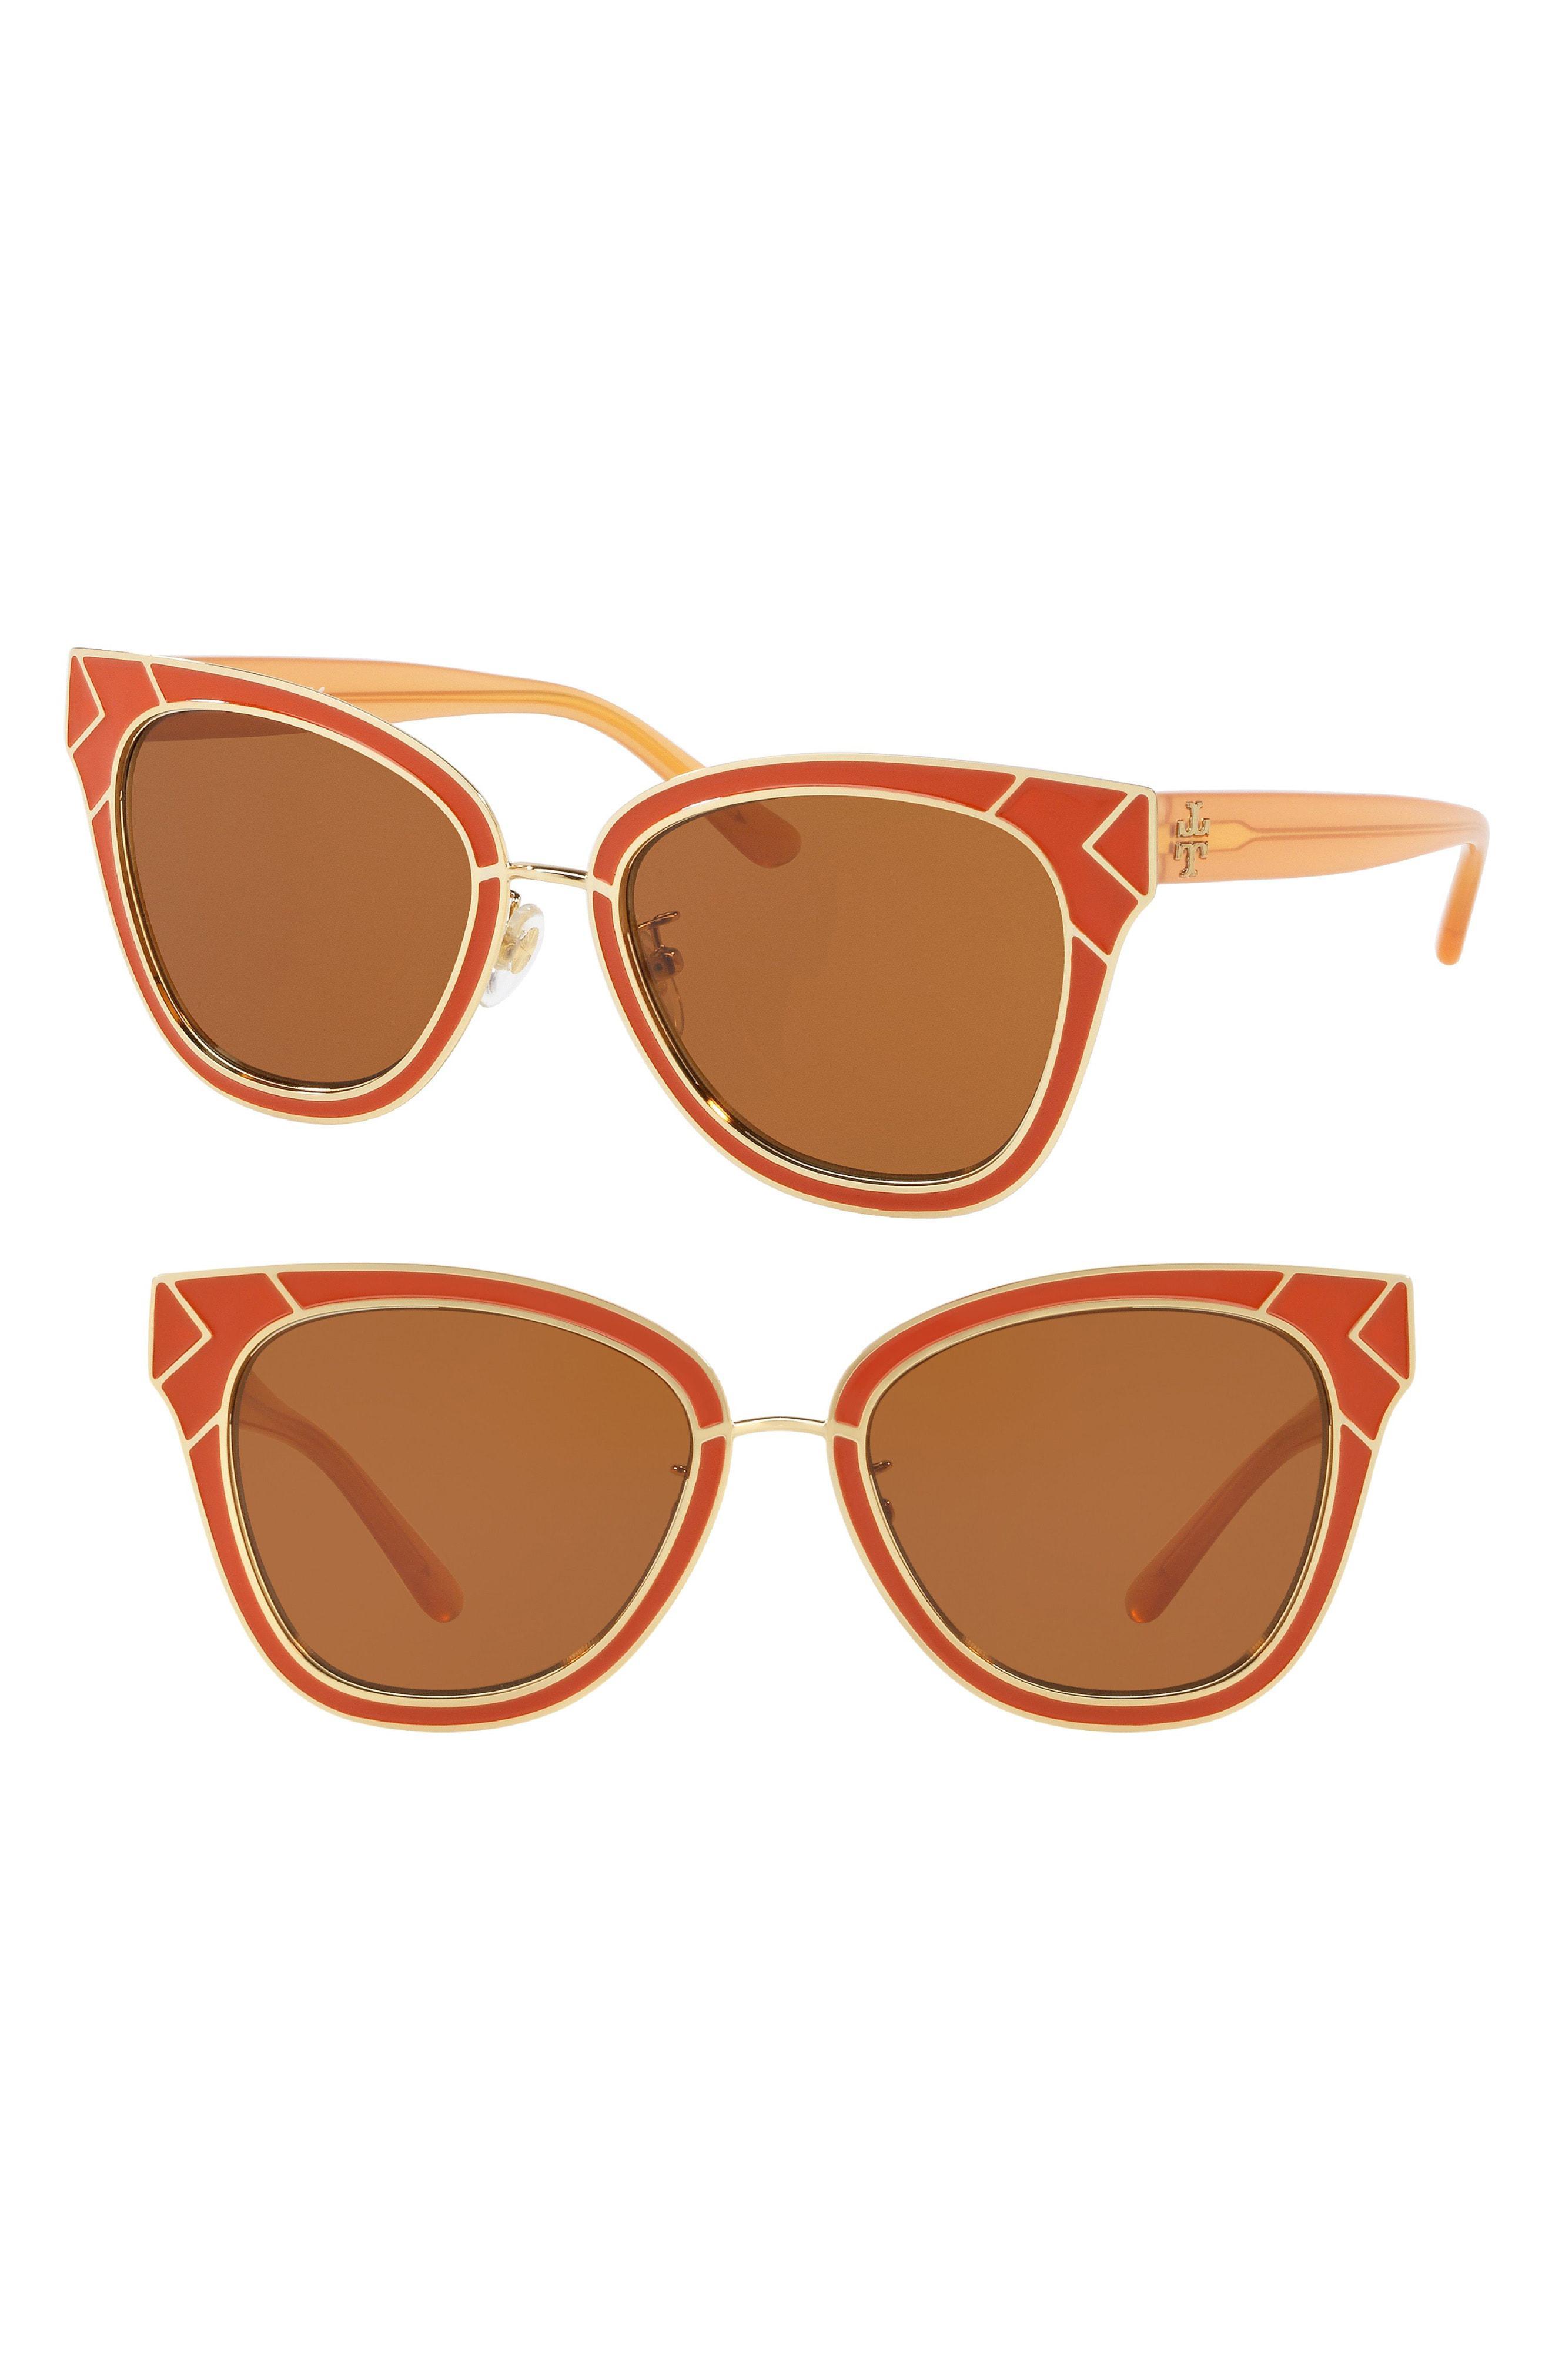 5ca1a2296b Lyst - Tory Burch Enamel San Ray 53mm Sunglasses in Brown